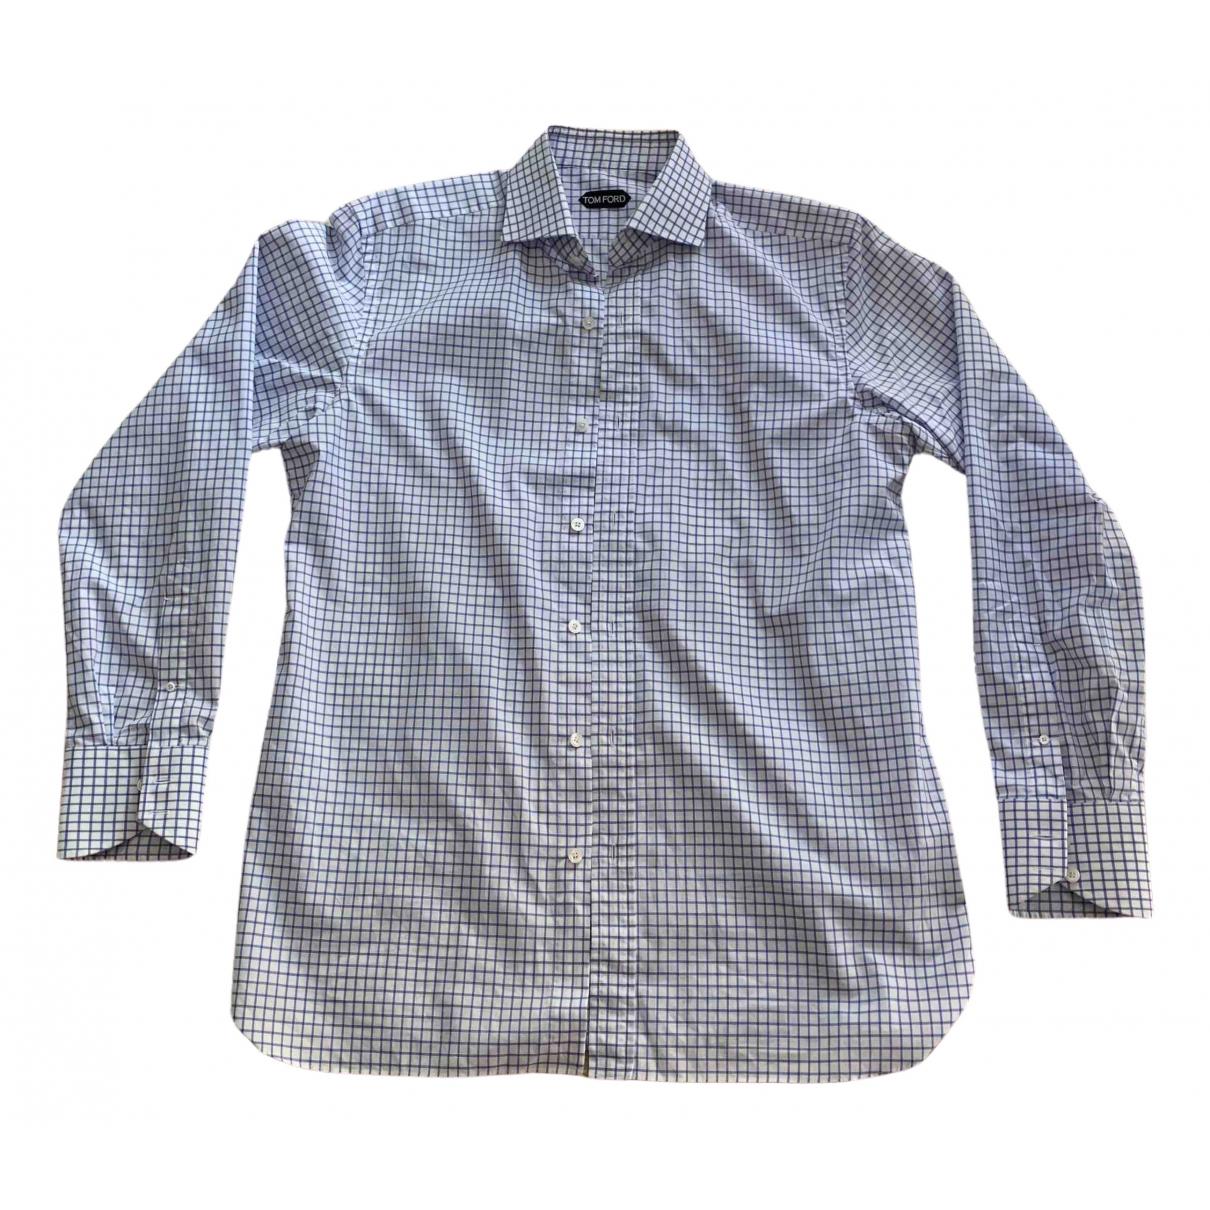 Tom Ford \N White Cotton Shirts for Men L International